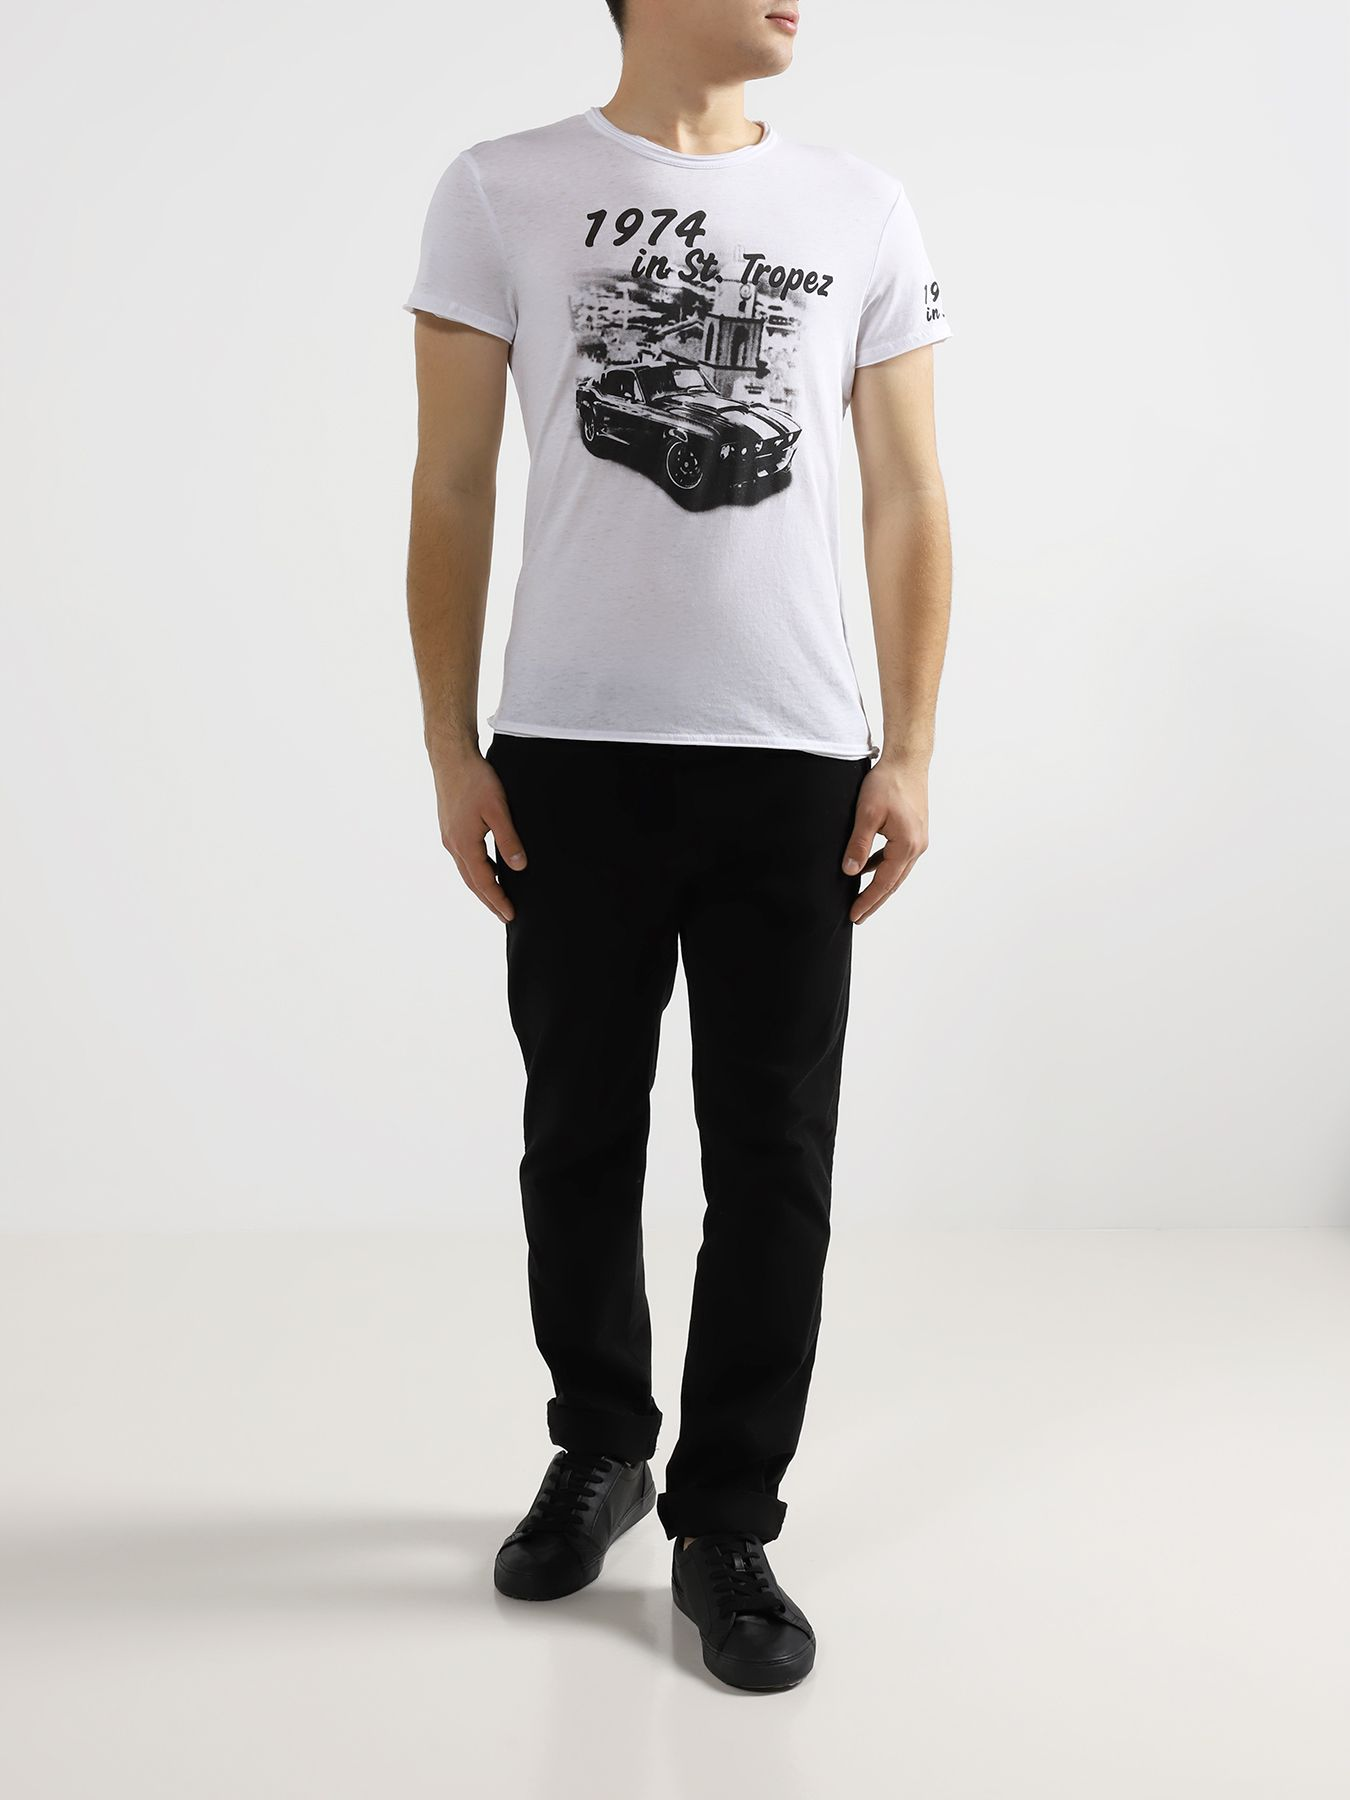 6 P.M. Мужская футболка 335052-028